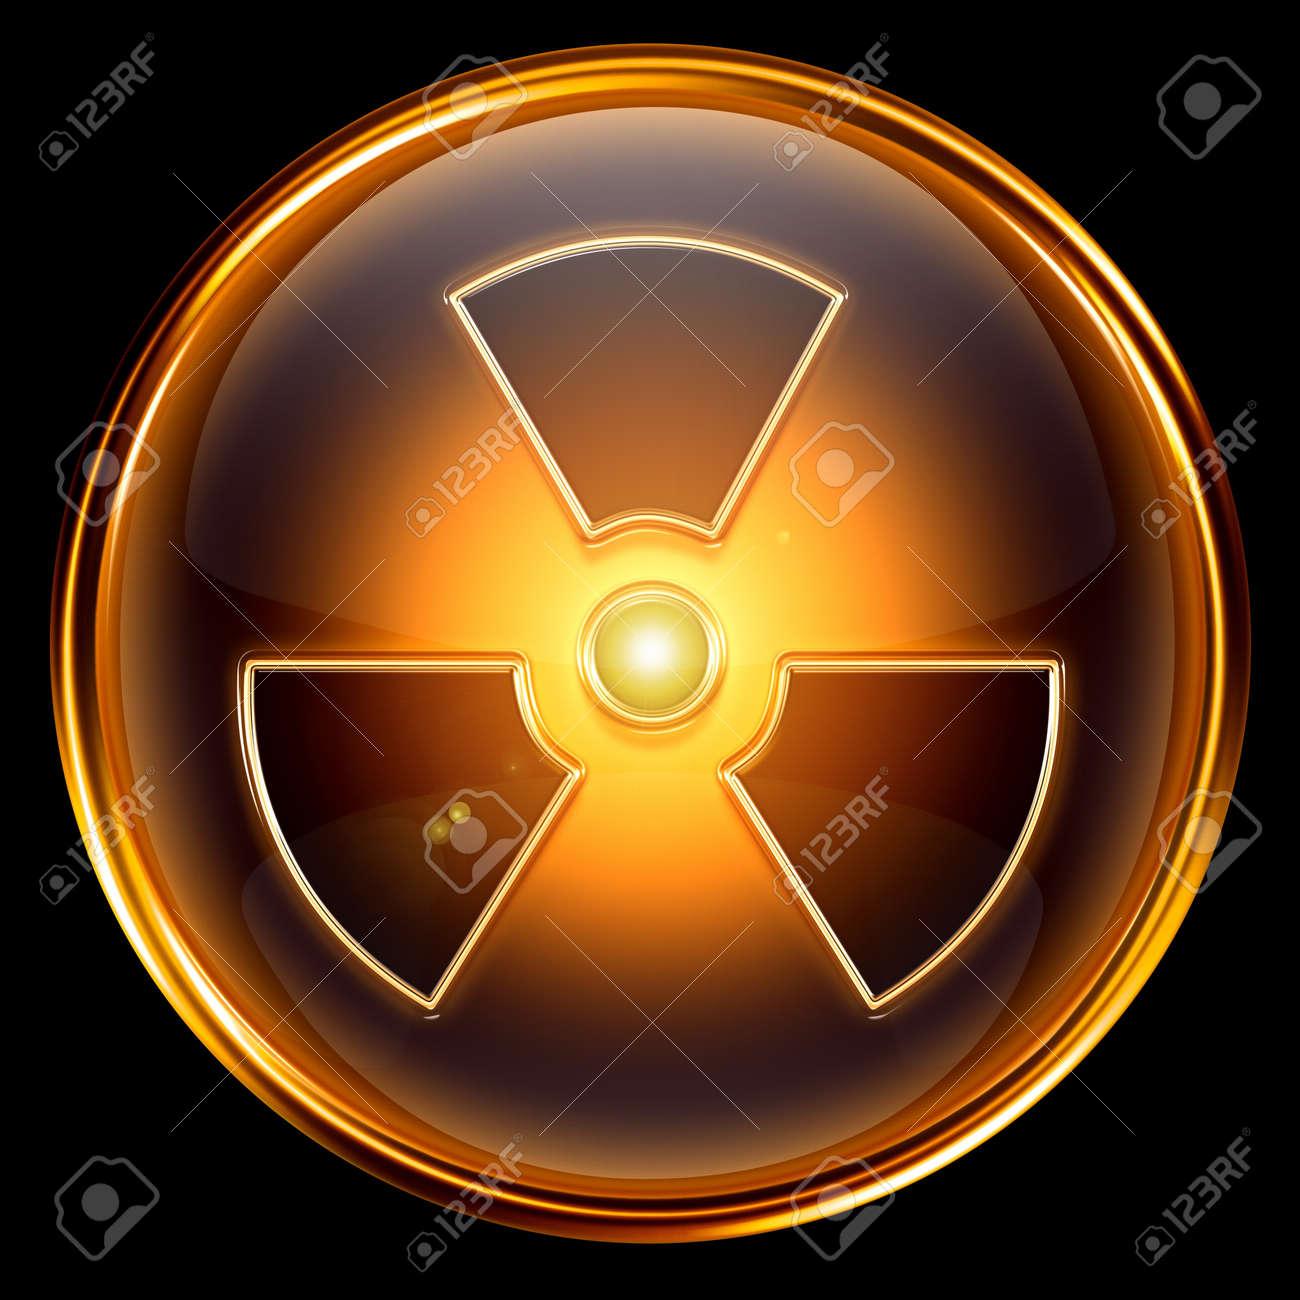 Radioactive icon golden, isolated on black background. Stock Photo - 7150598